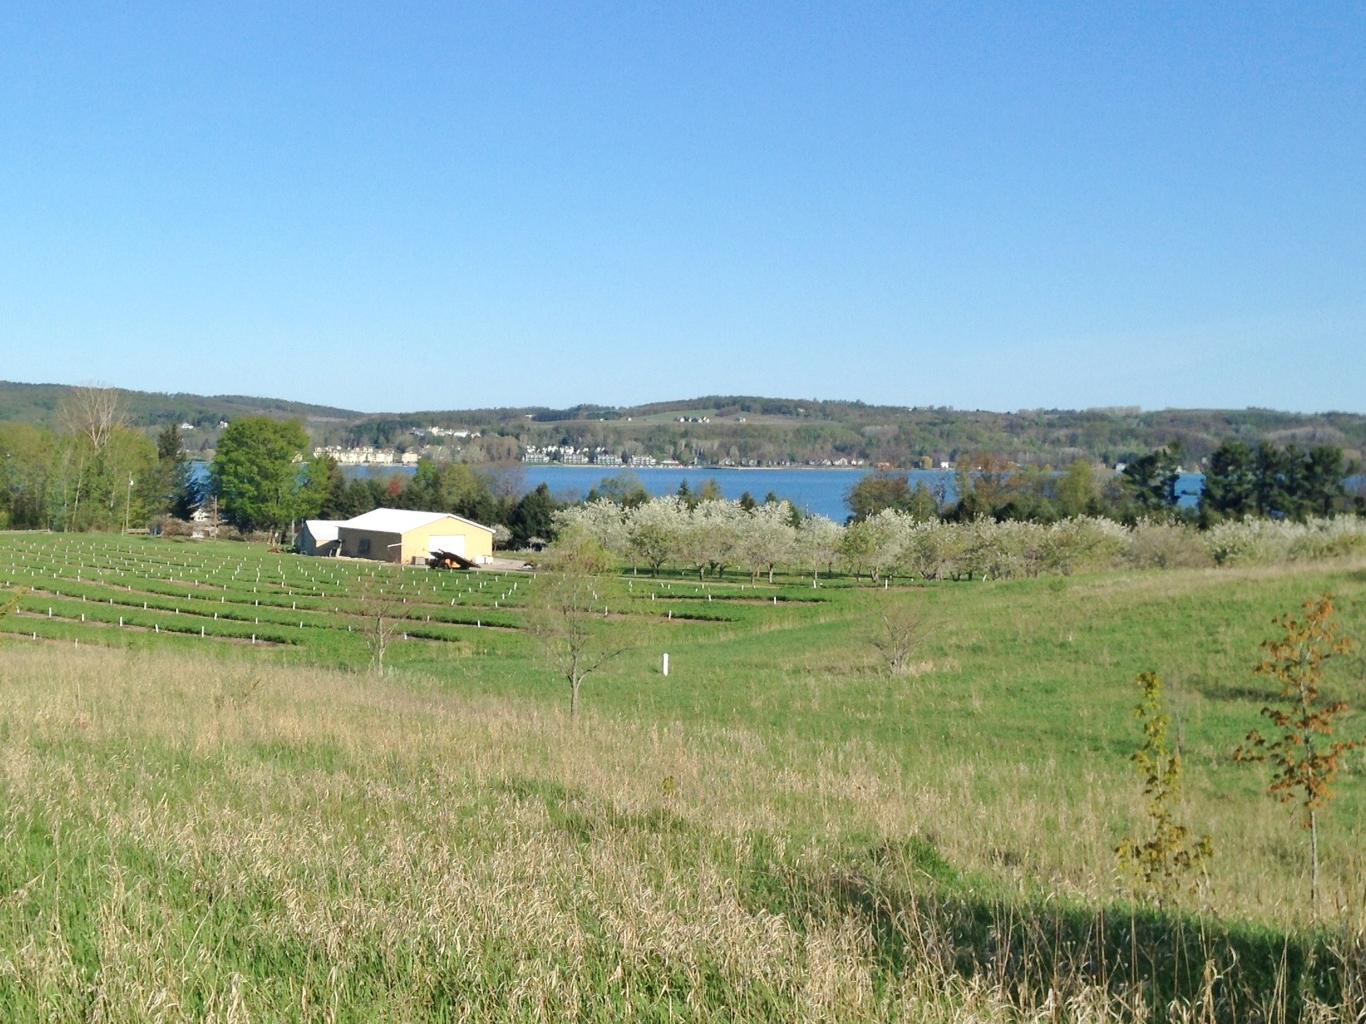 760+S+Village+View+Suttons+Bay+Leelanau+County+Waterview+vacant+lot+for+sale+by+Oltersdorf+Realty+LLC+Leelanau+Realtors+18 (1).jpg